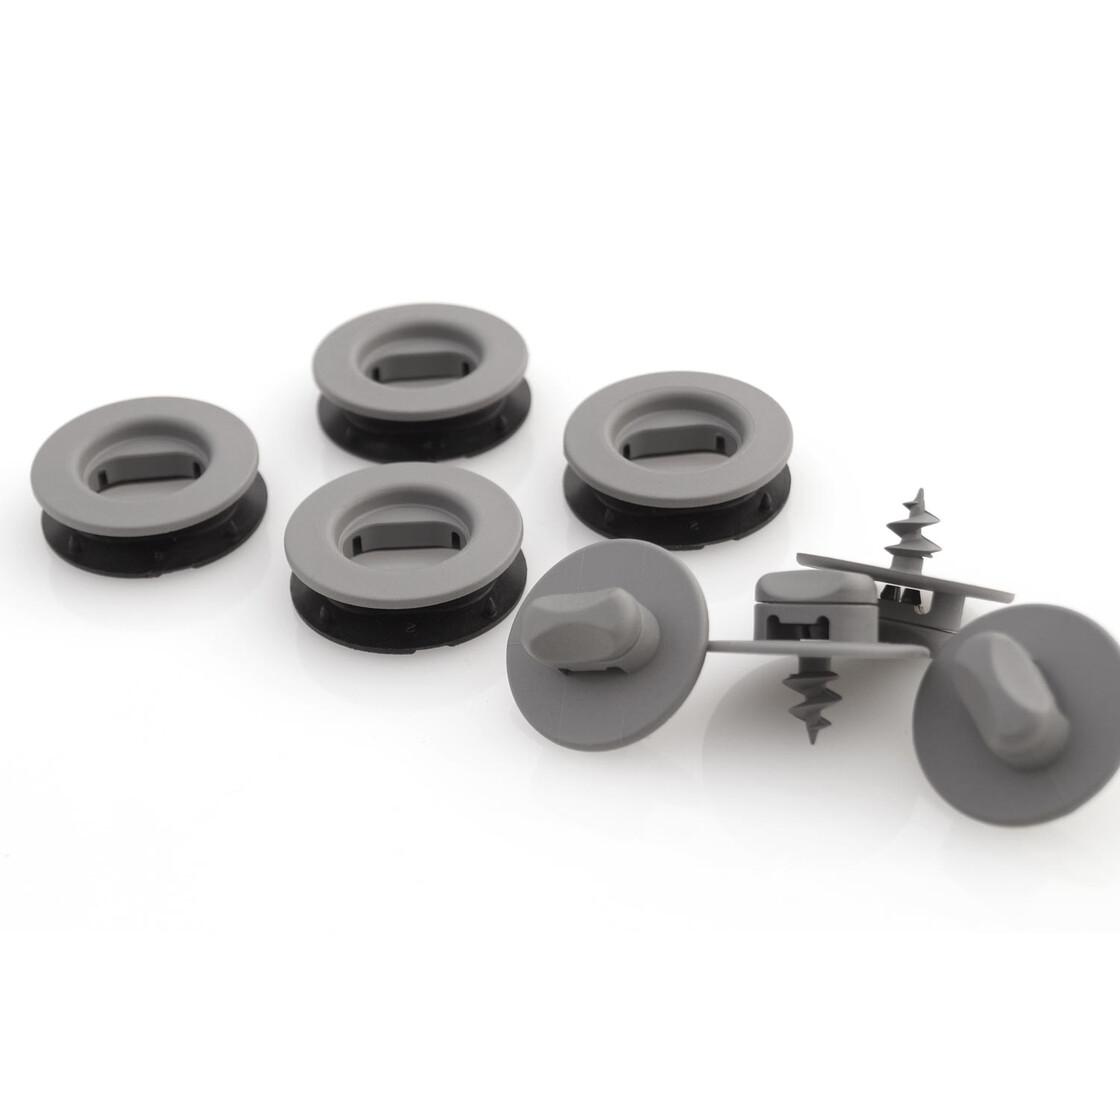 fu matten drehknebel oval grau befestigung halter 12 teilig. Black Bedroom Furniture Sets. Home Design Ideas